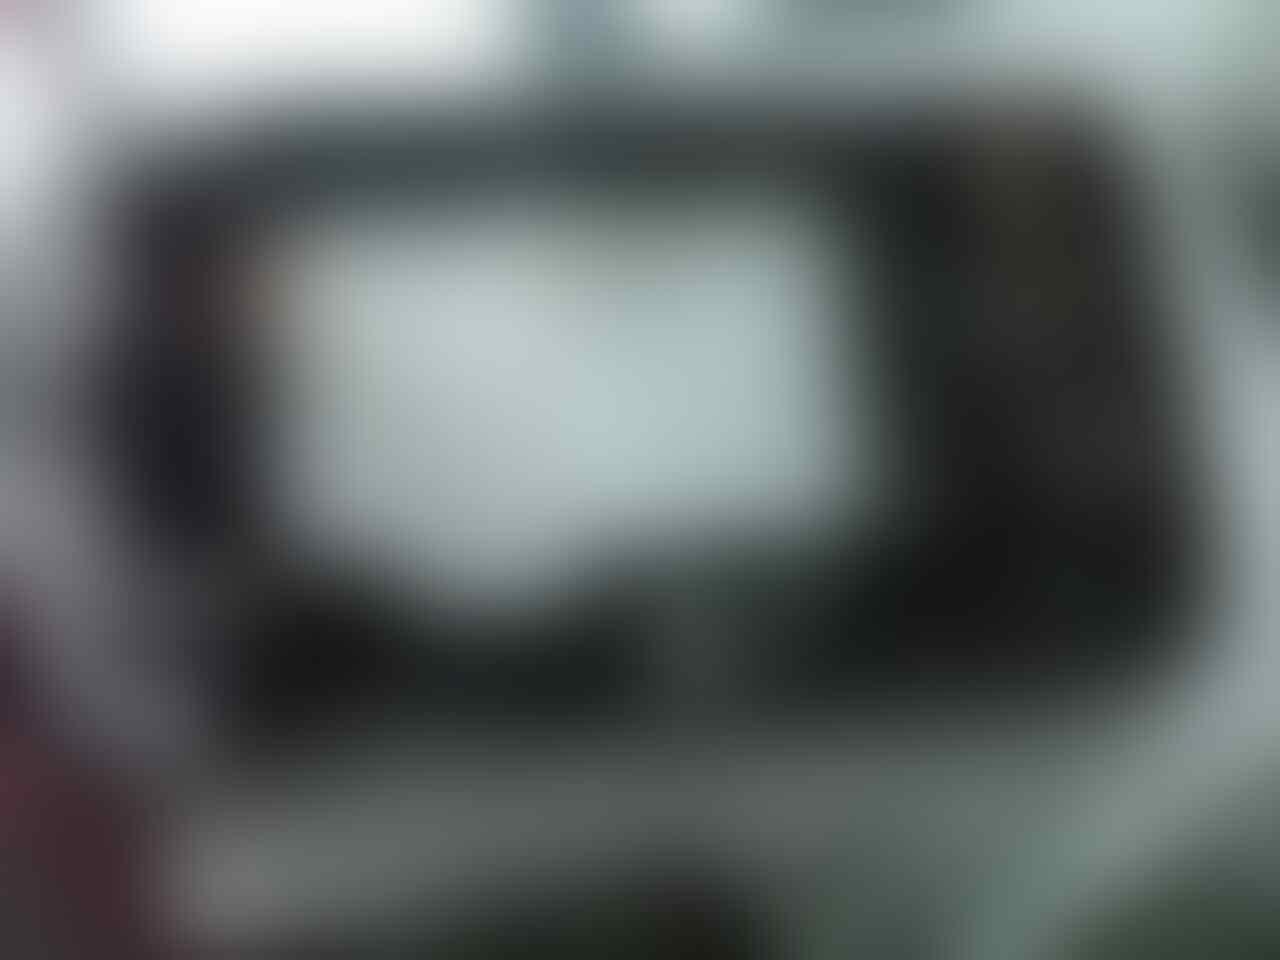 berbagai aksesoris blackberry / BB murah! Batre/ battery ori, cassing fullset ori dll